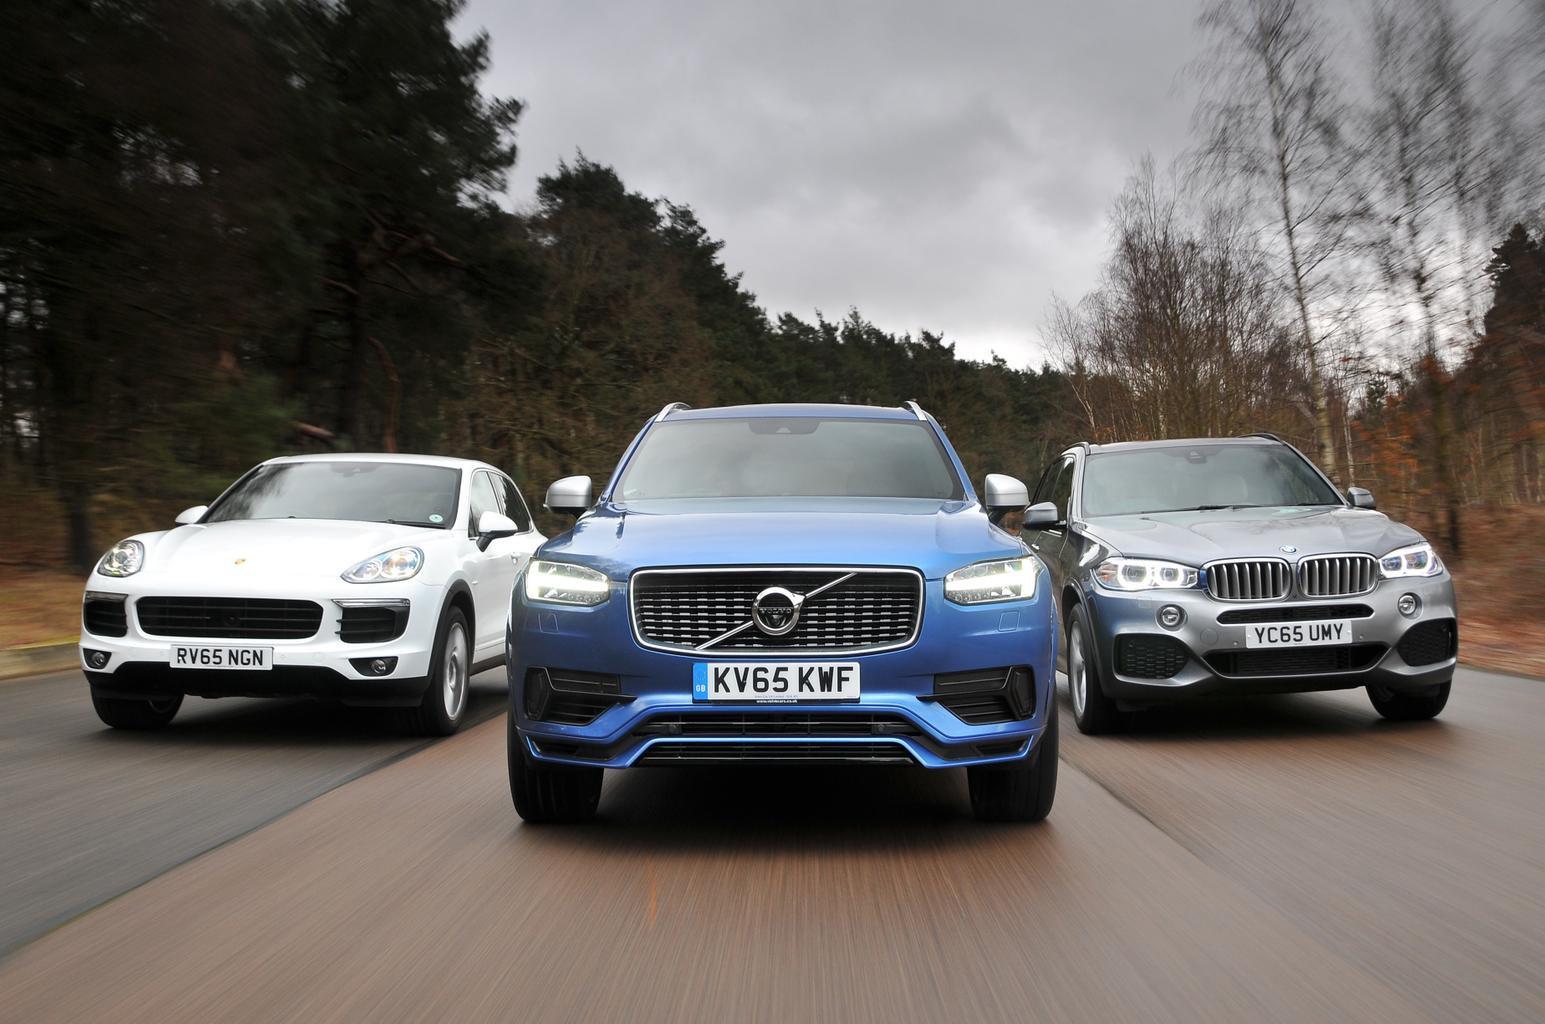 BMW X5 vs Porsche Cayenne vs Volvo XC90